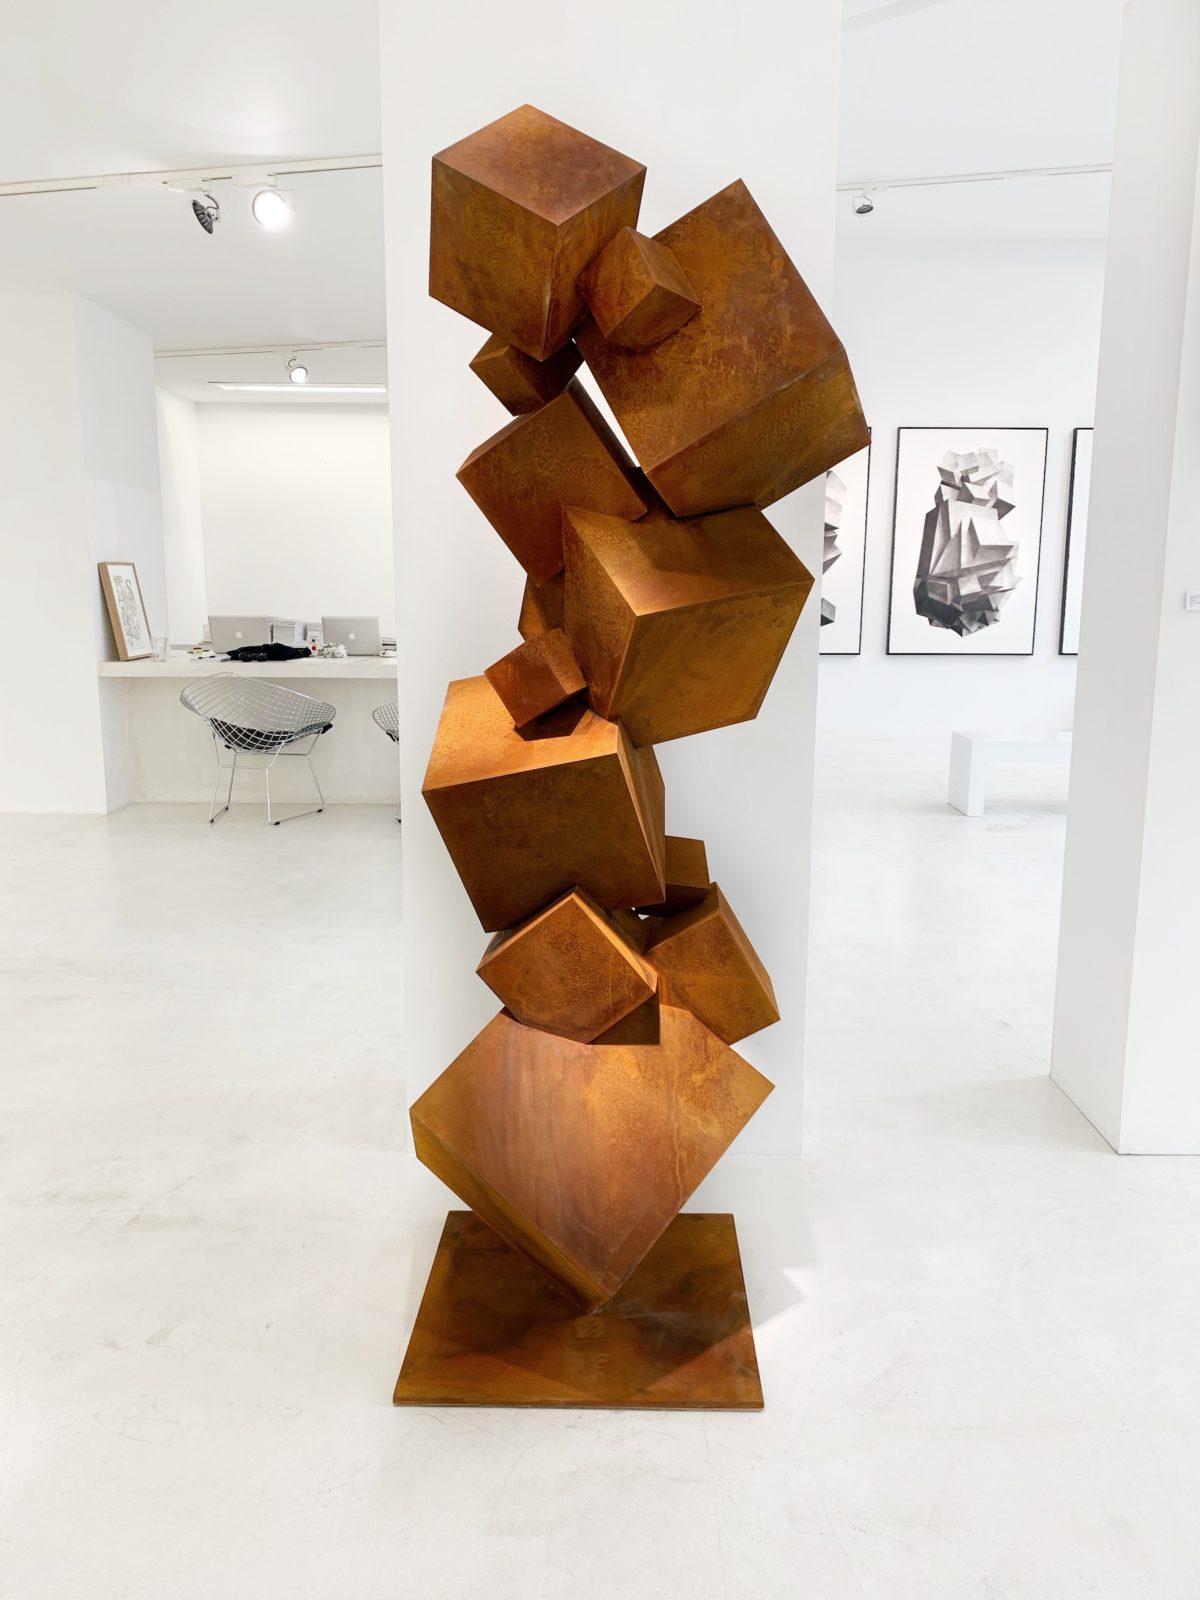 Roda sculpture 2